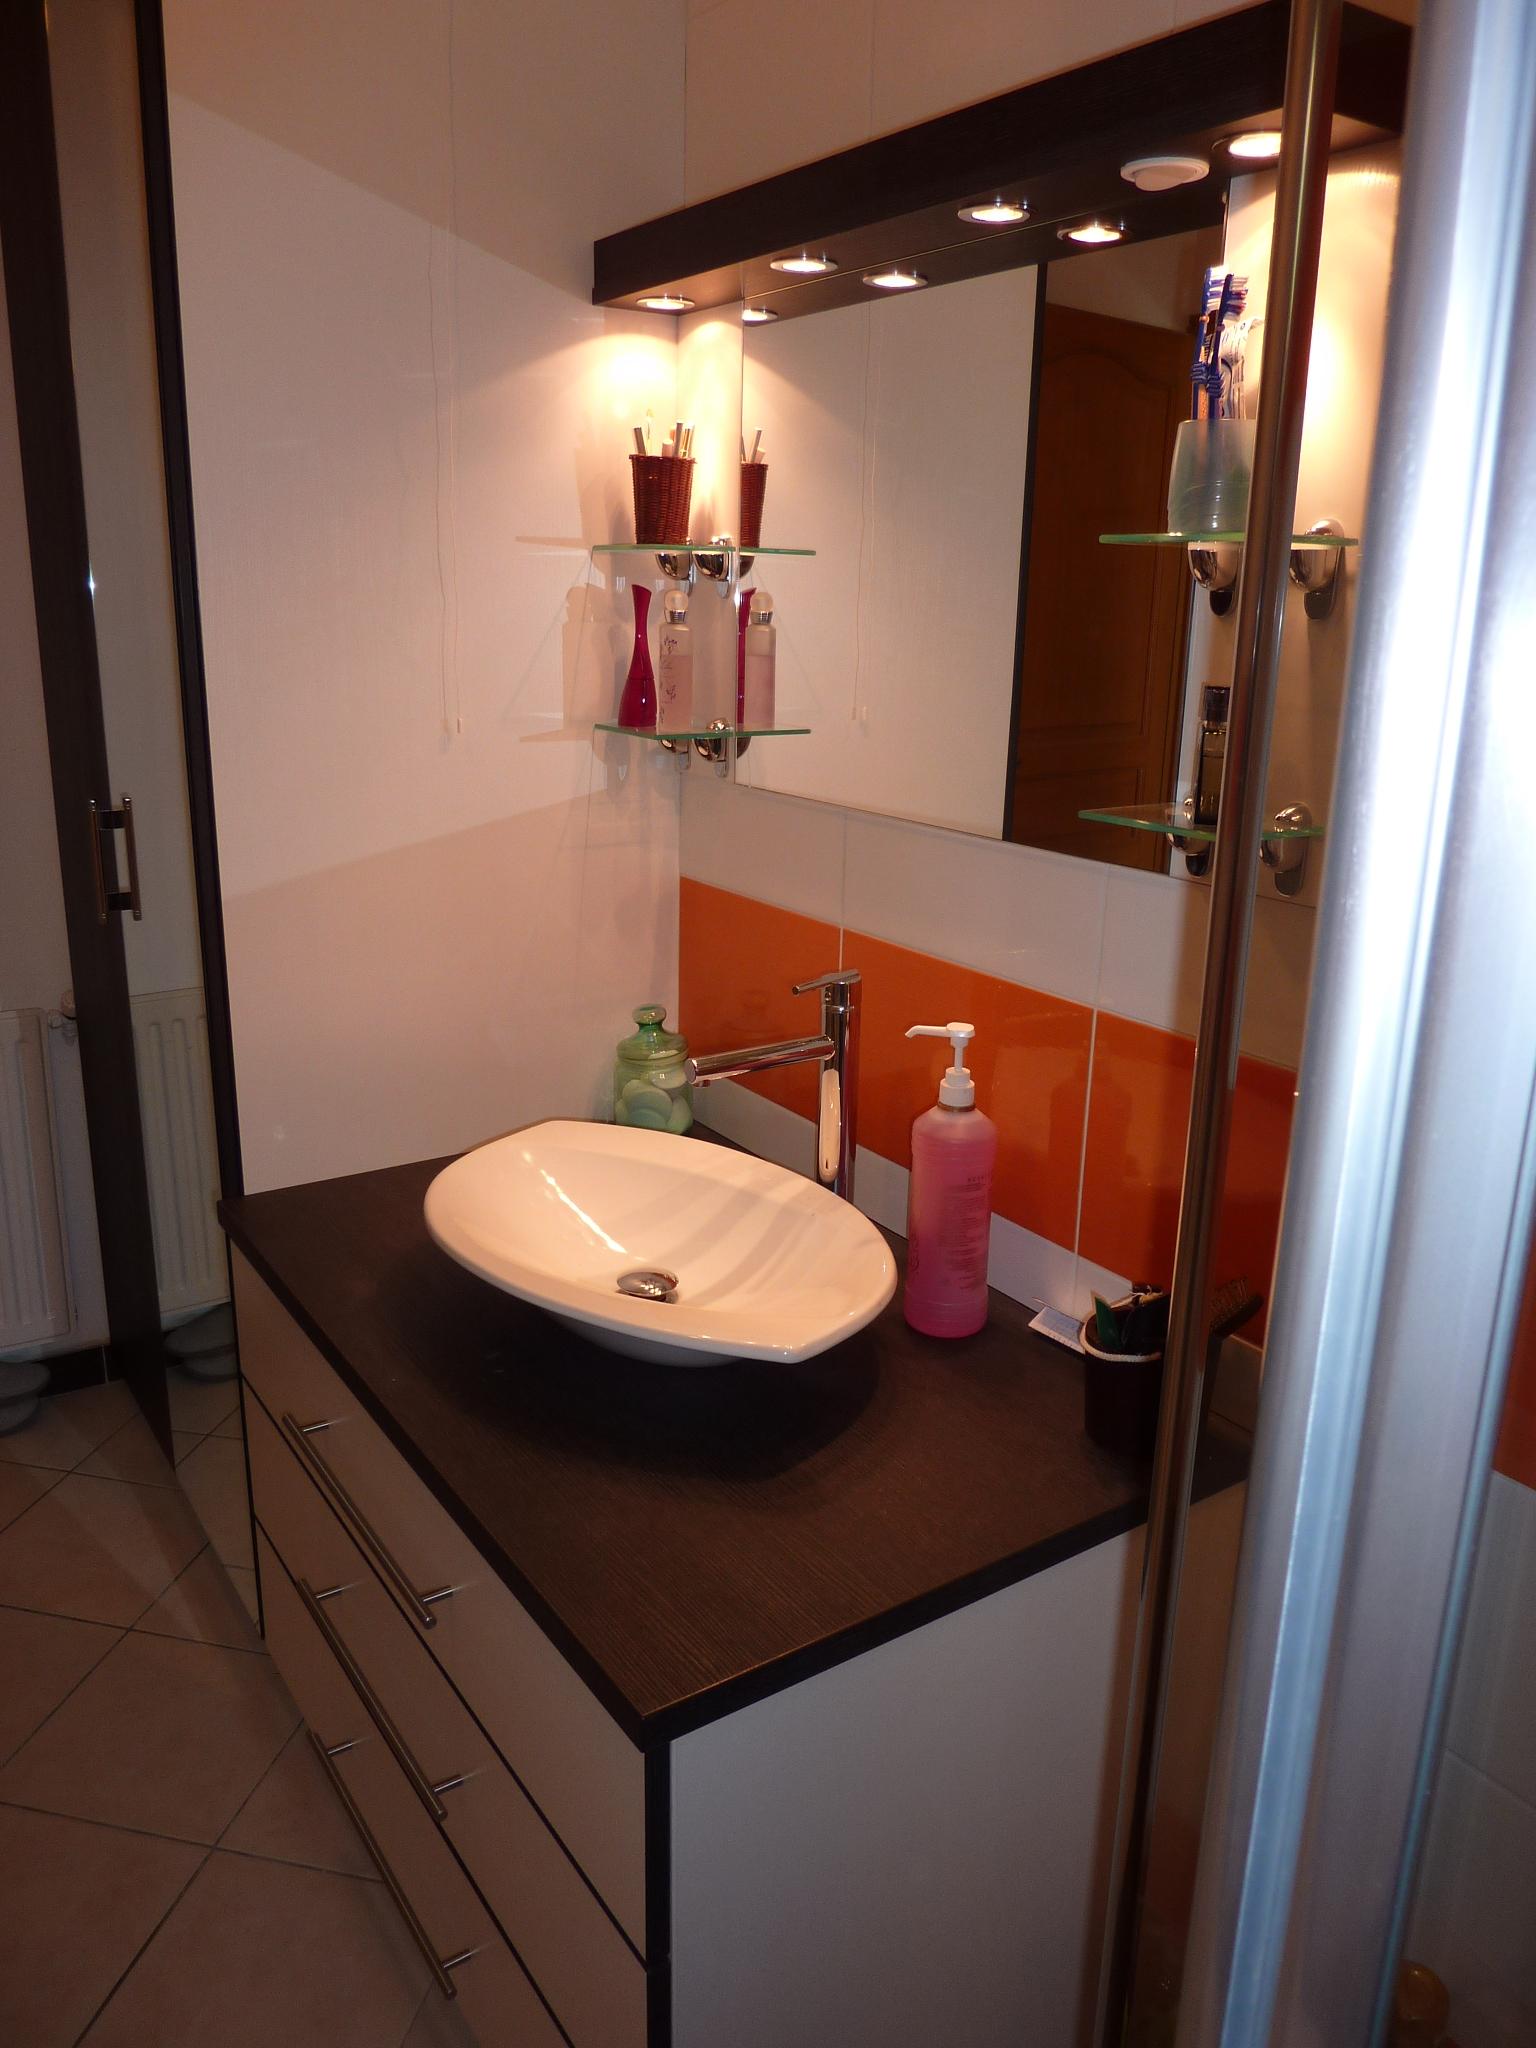 Meuble de salle de bains avec grands tiroirs ralentisseurs for Meuble de salle de bain avec porte